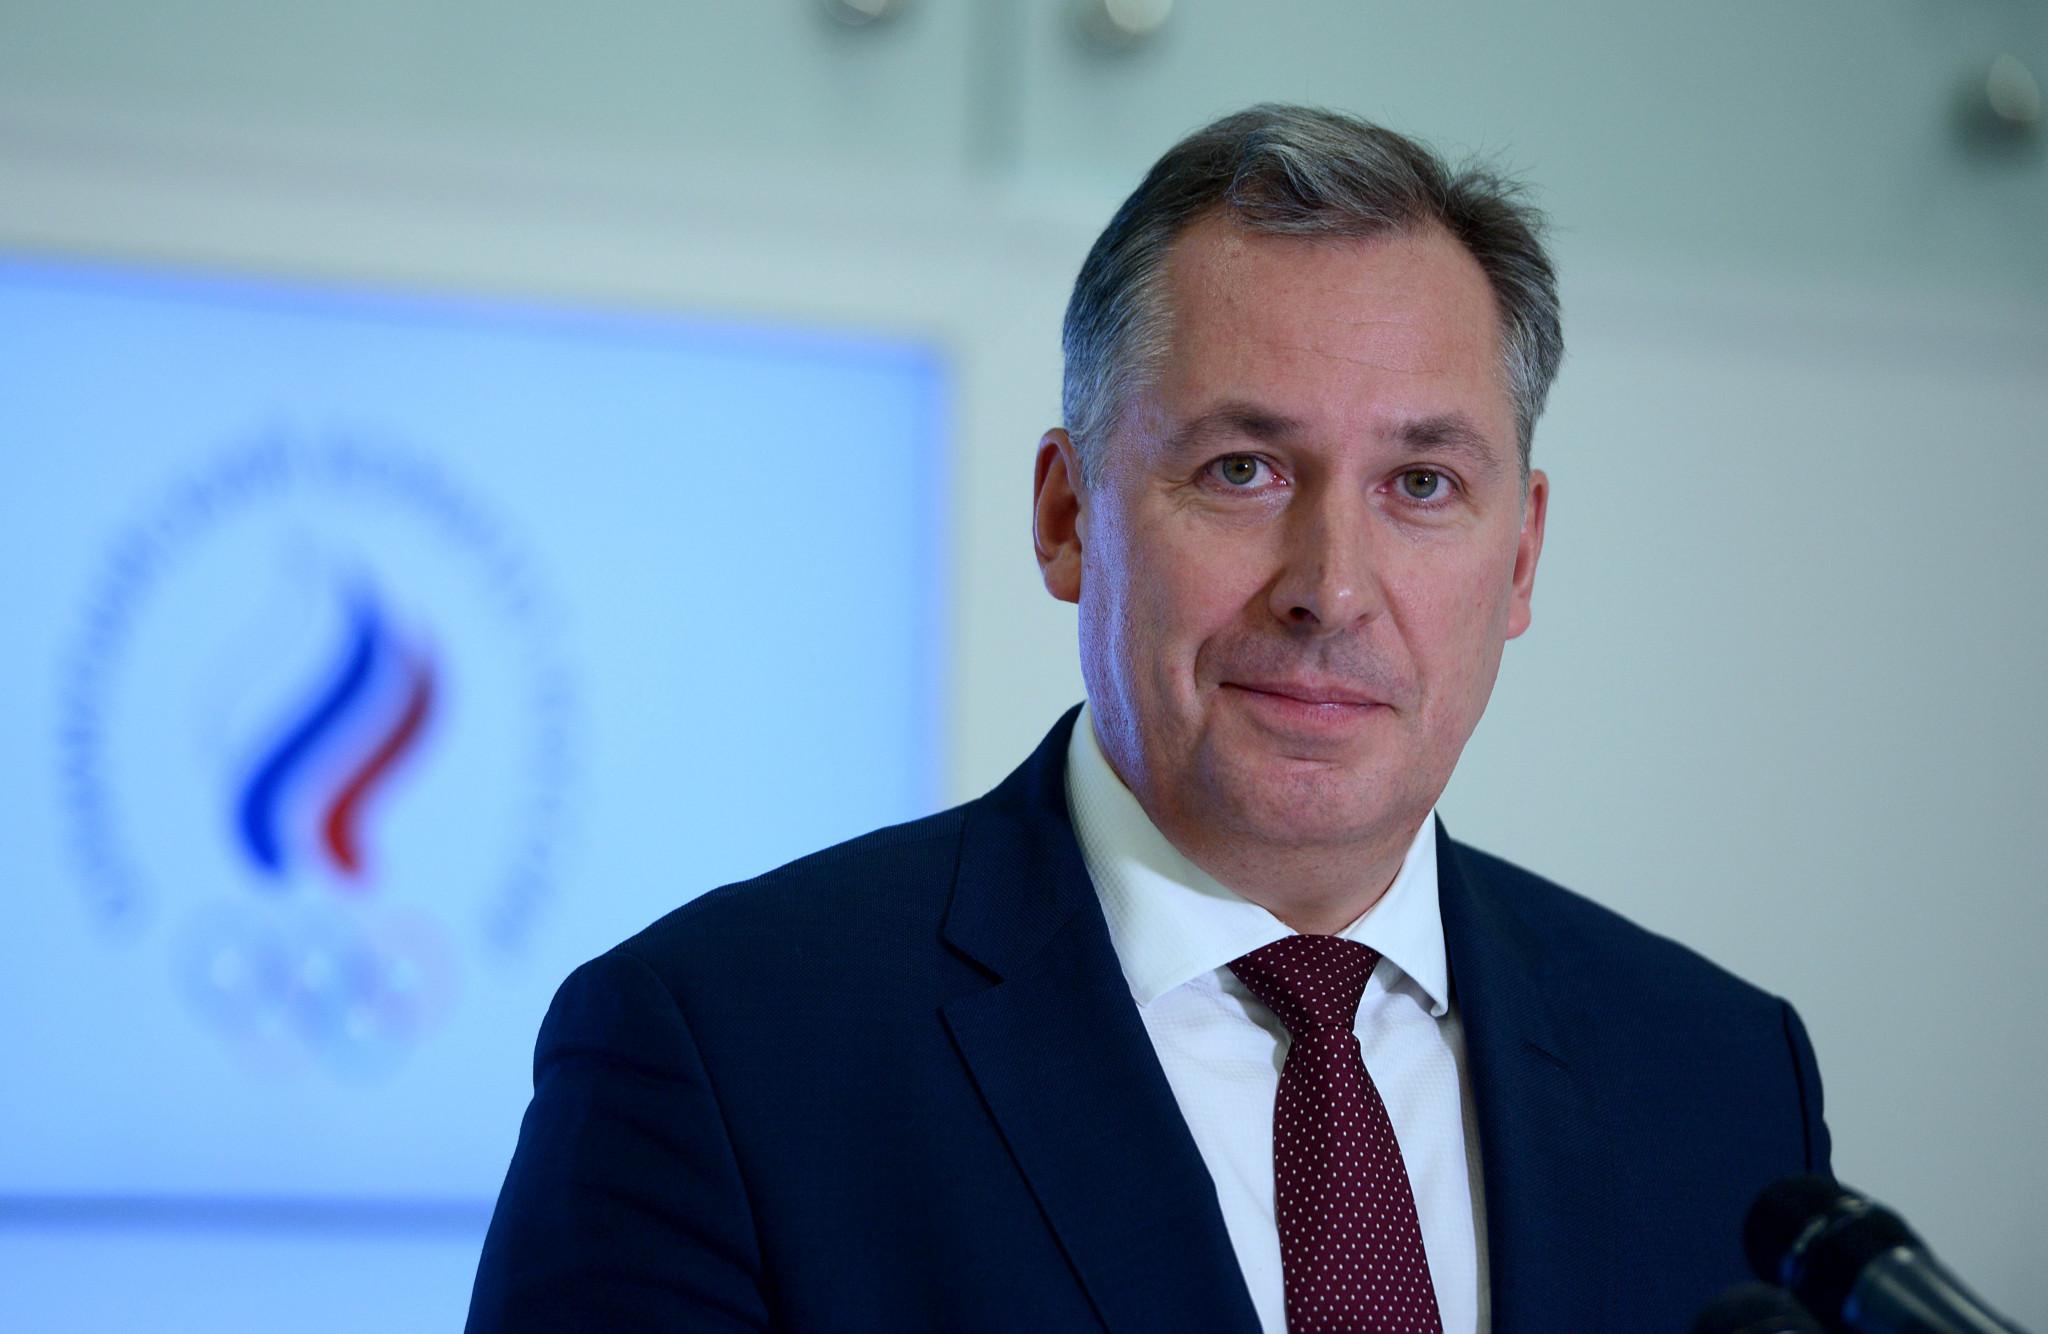 EFC President Stanislav Pozdnyakov said during his opening address that the coronavirus pandemic was an